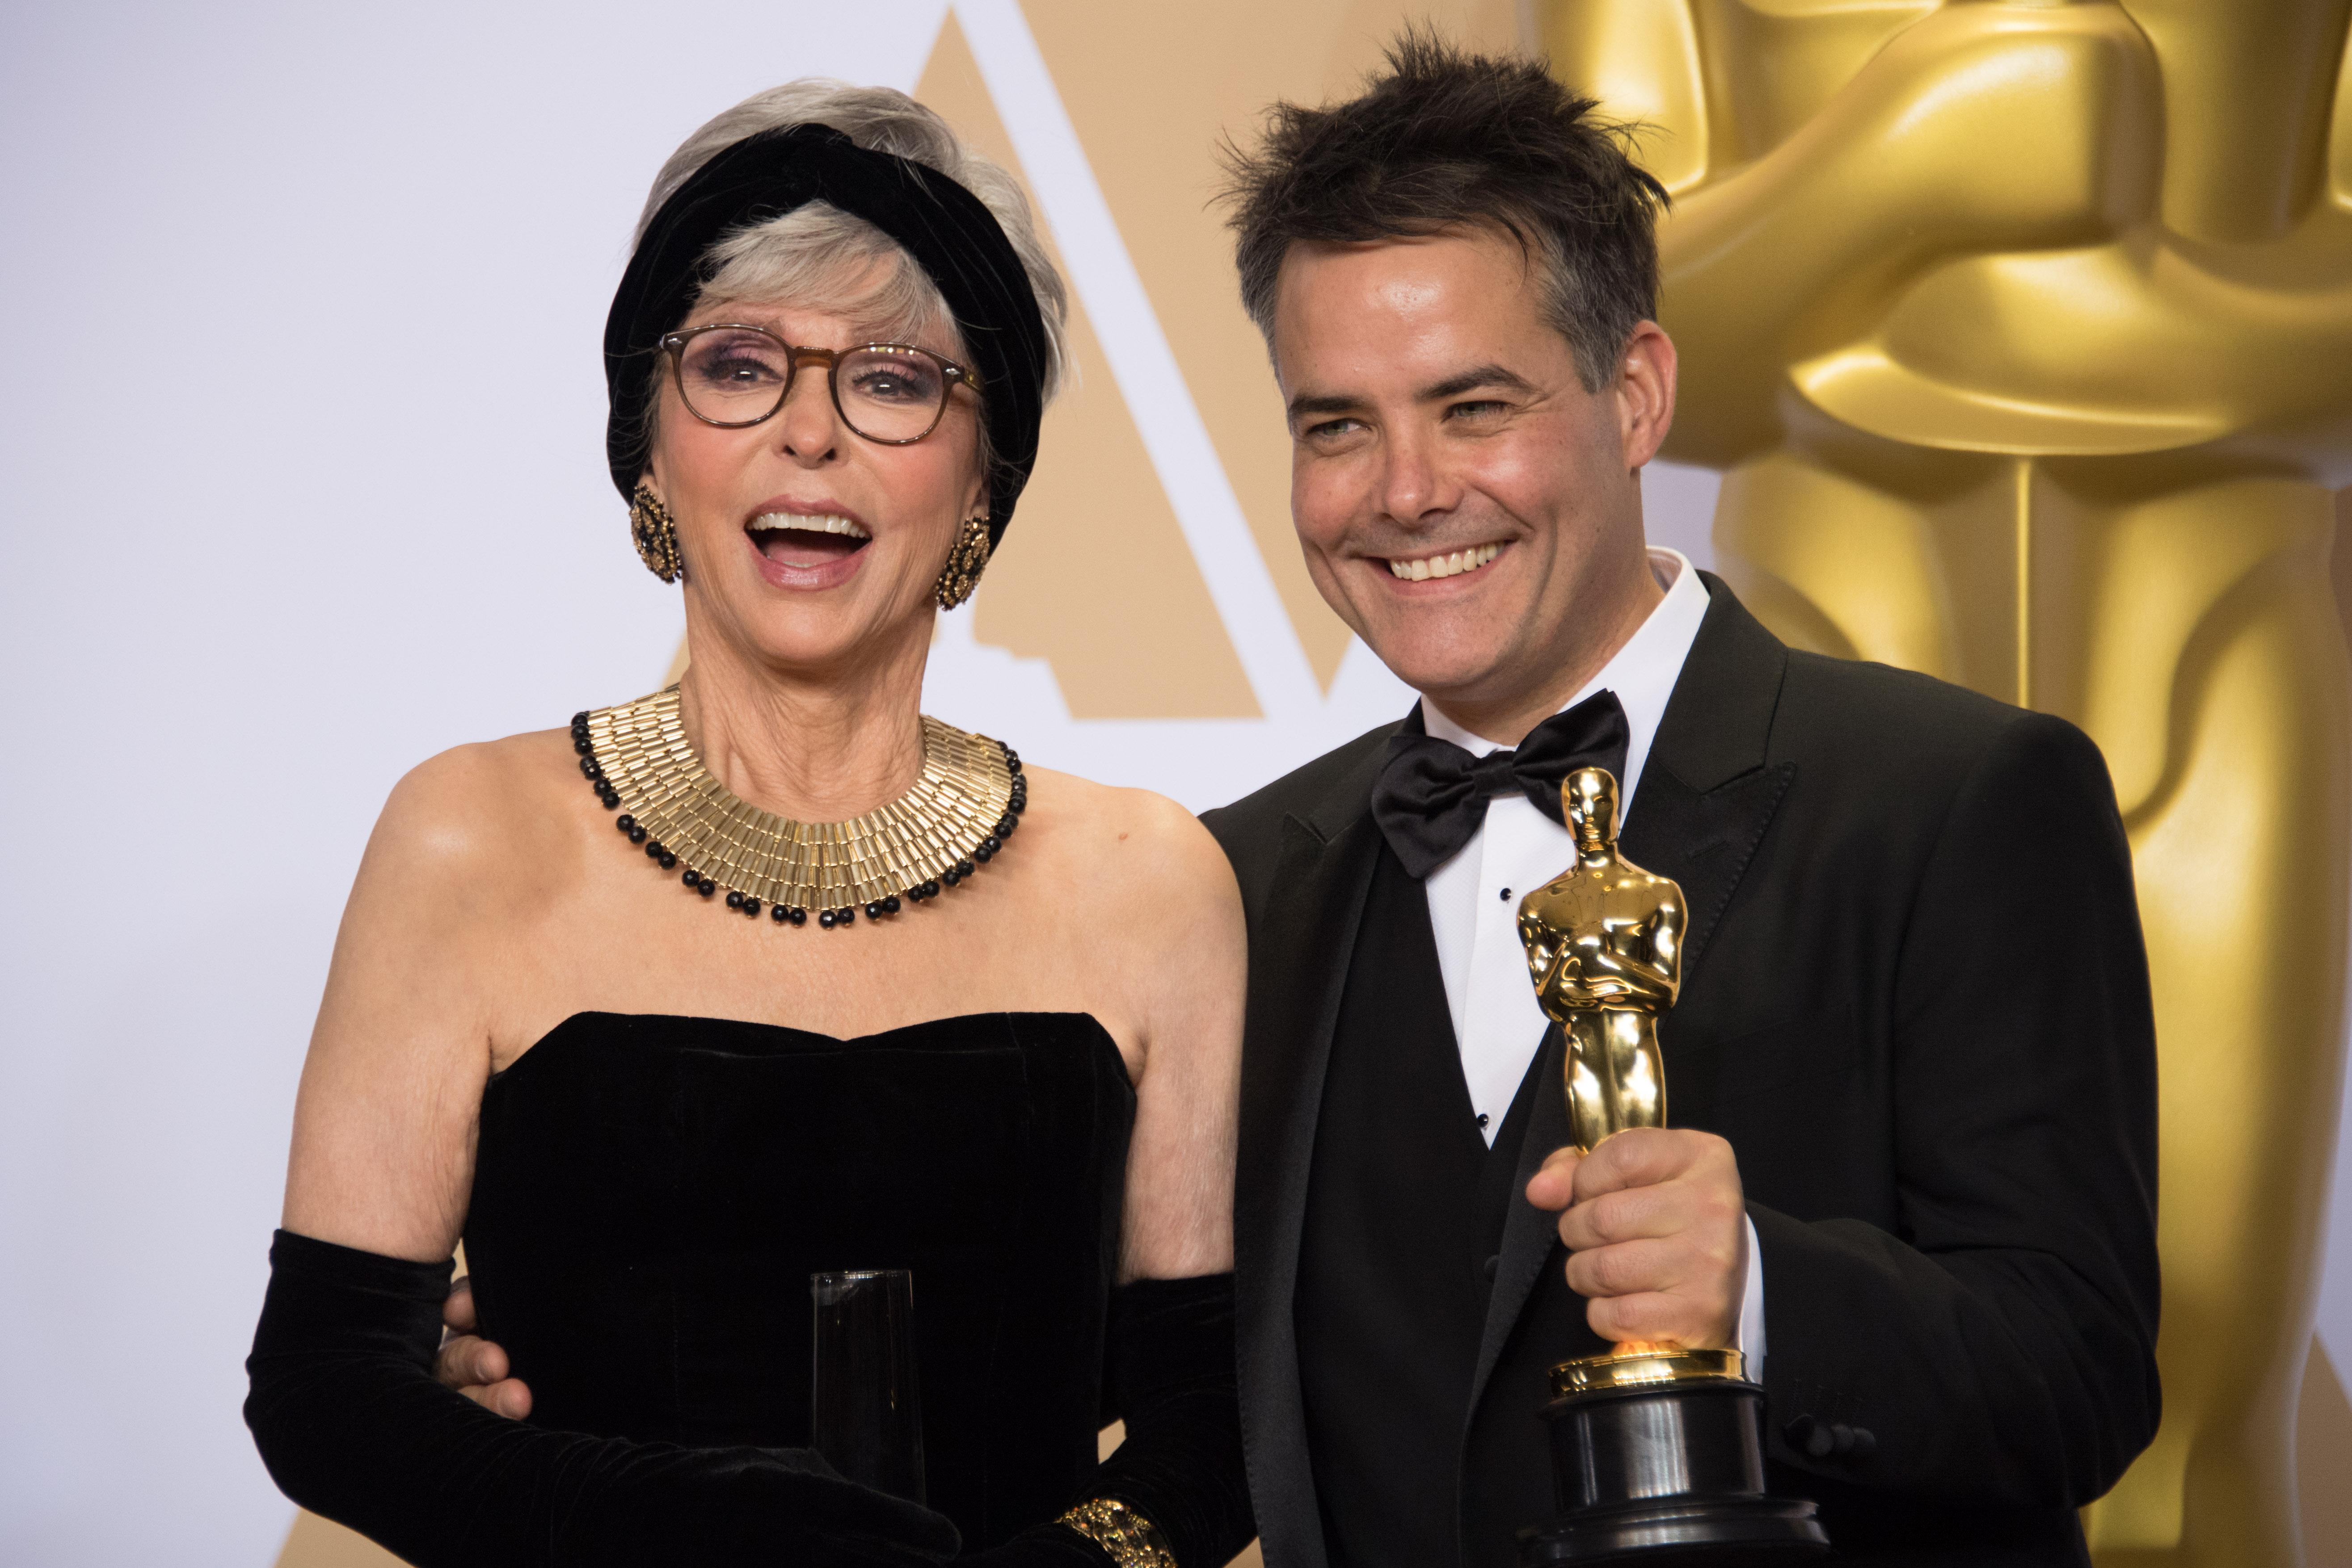 Oscars 2018 A Fantastic Woman wins Best Foreign Language Film